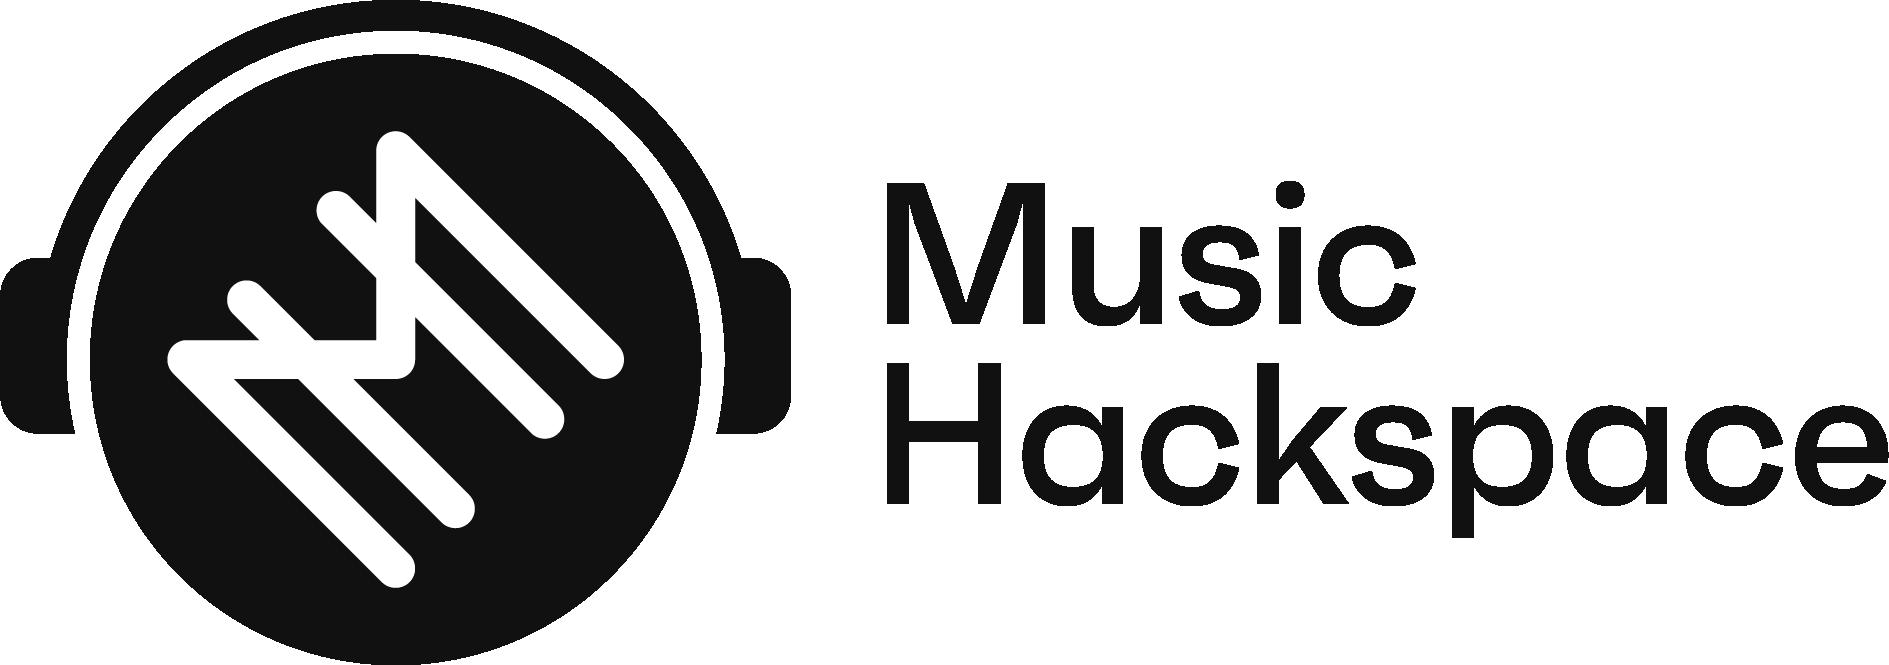 Music Hackspace Home